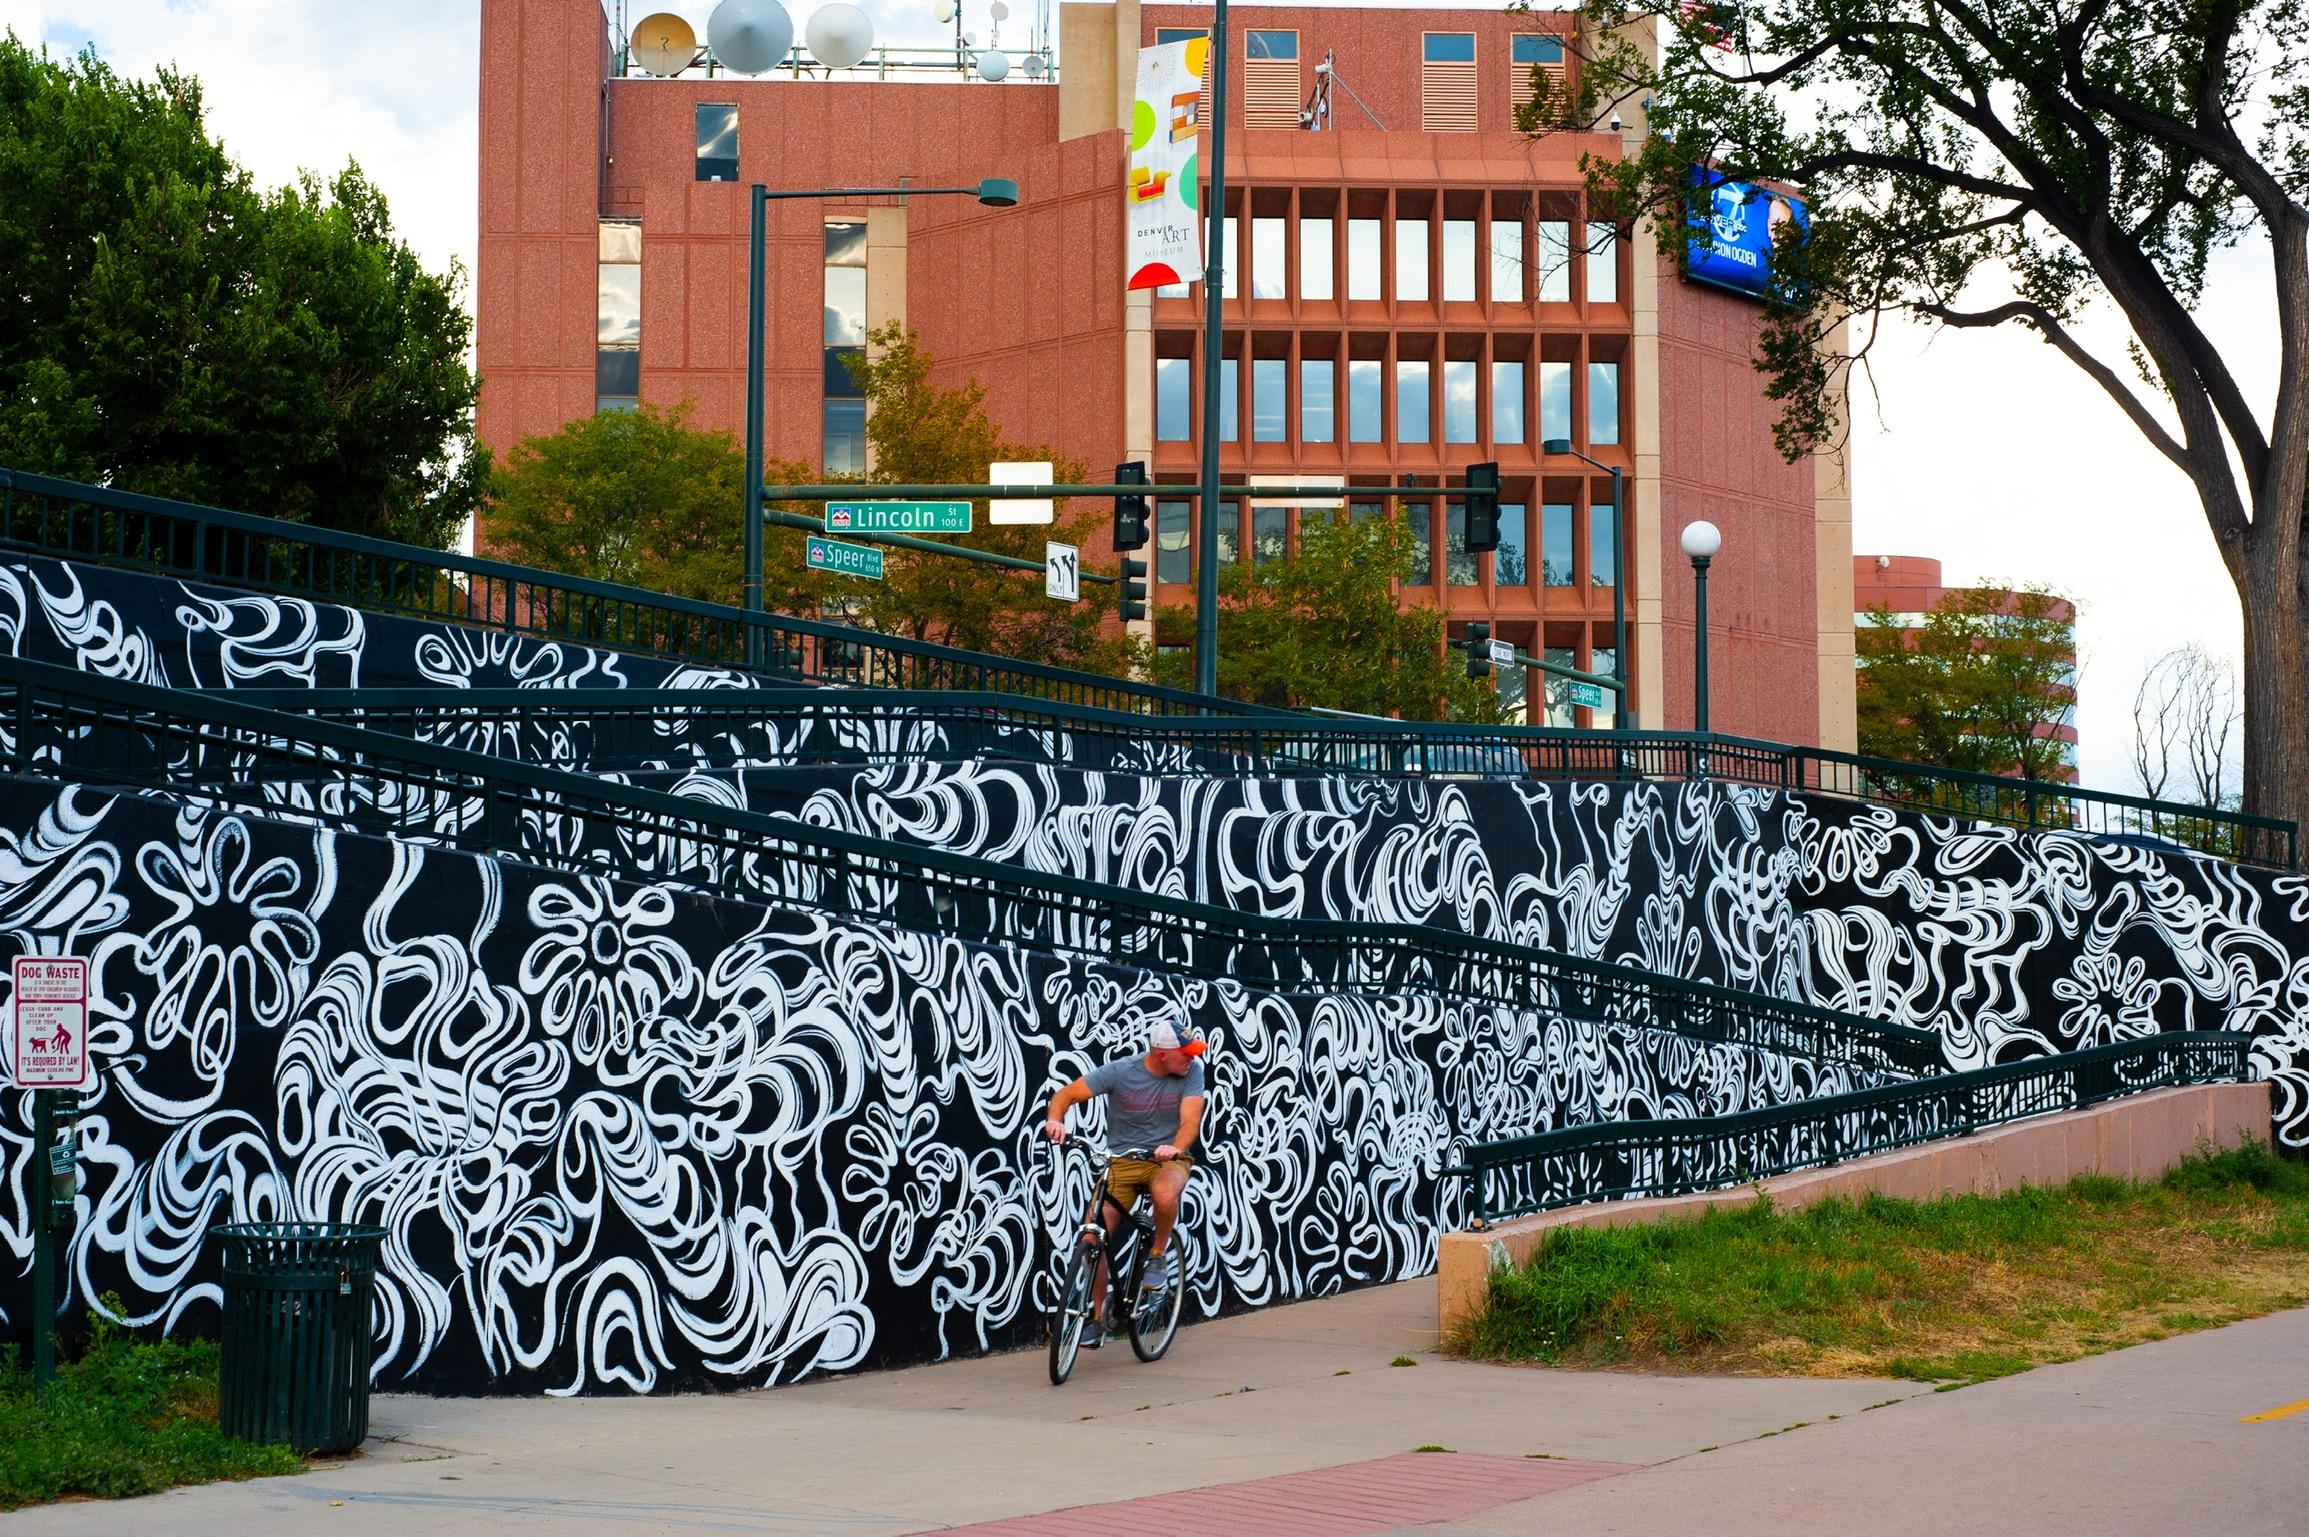 Denver Urban Arts Fund Mural (2019)